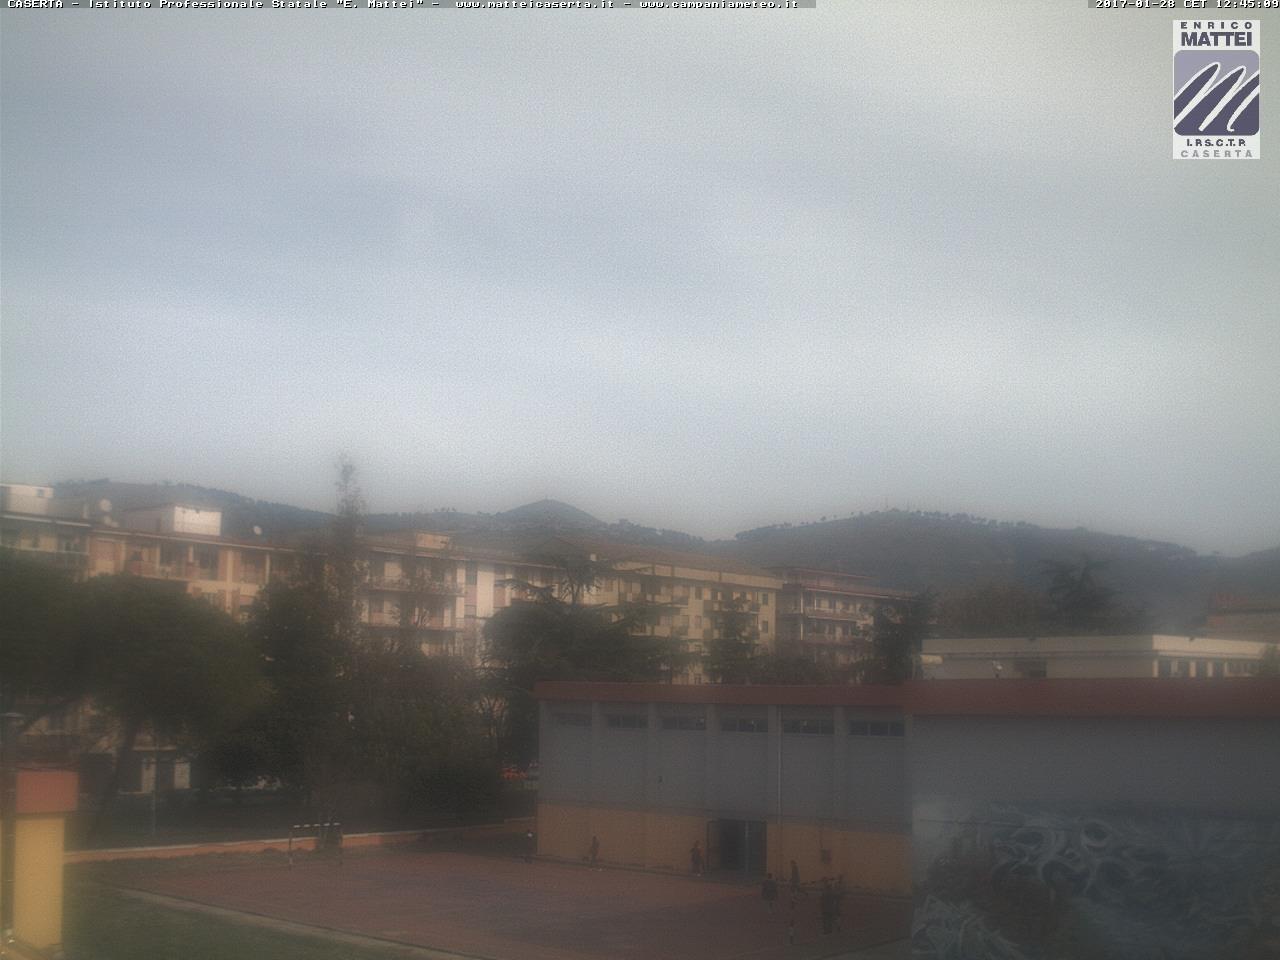 Webcam Caserta - Campania Meteo